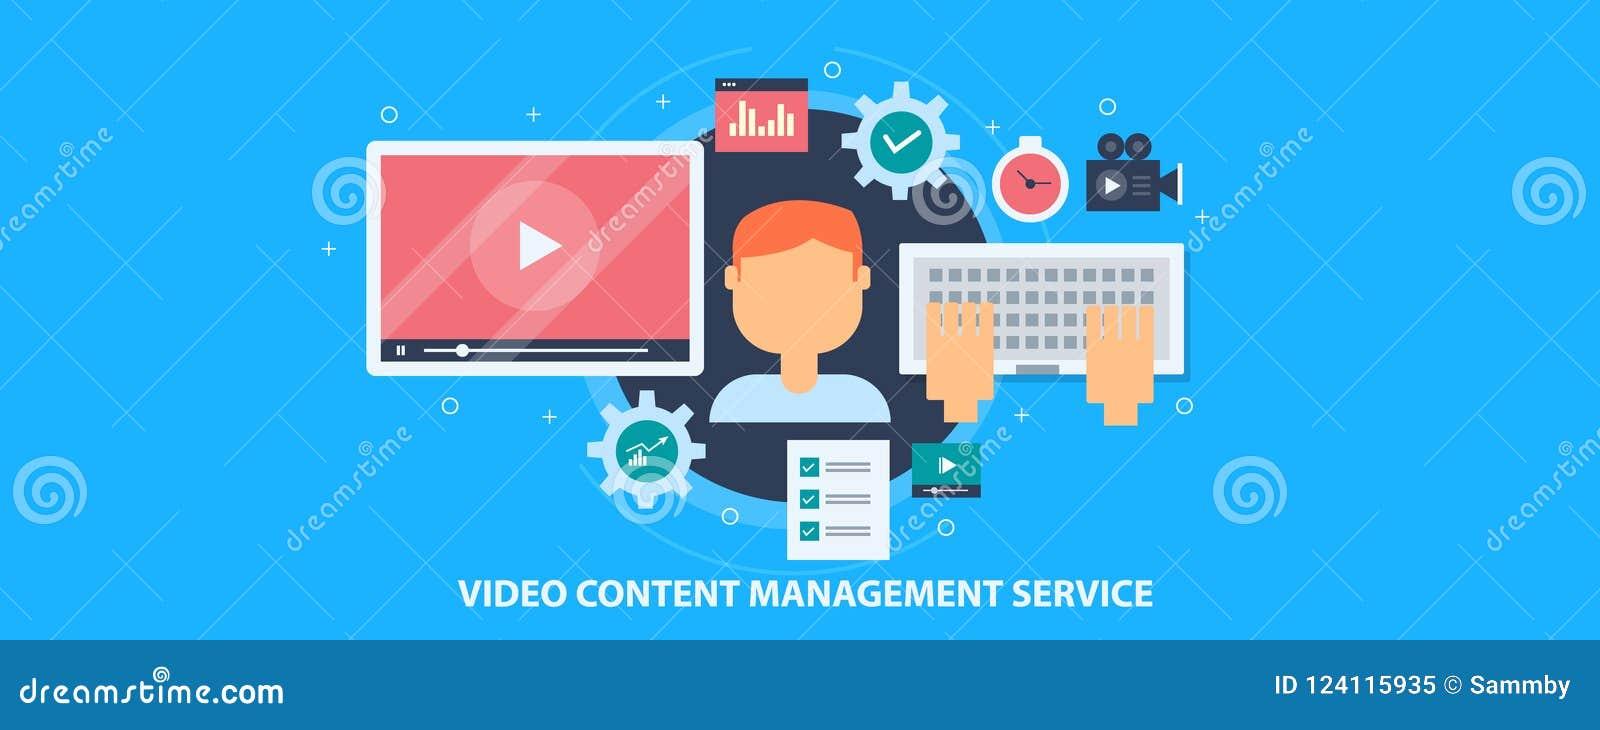 Video Content Management Service Digital Content Video Editing Publication Software Concept Flat Design Vector Banner Stock Vector Illustration Of Banner Flat 124115935